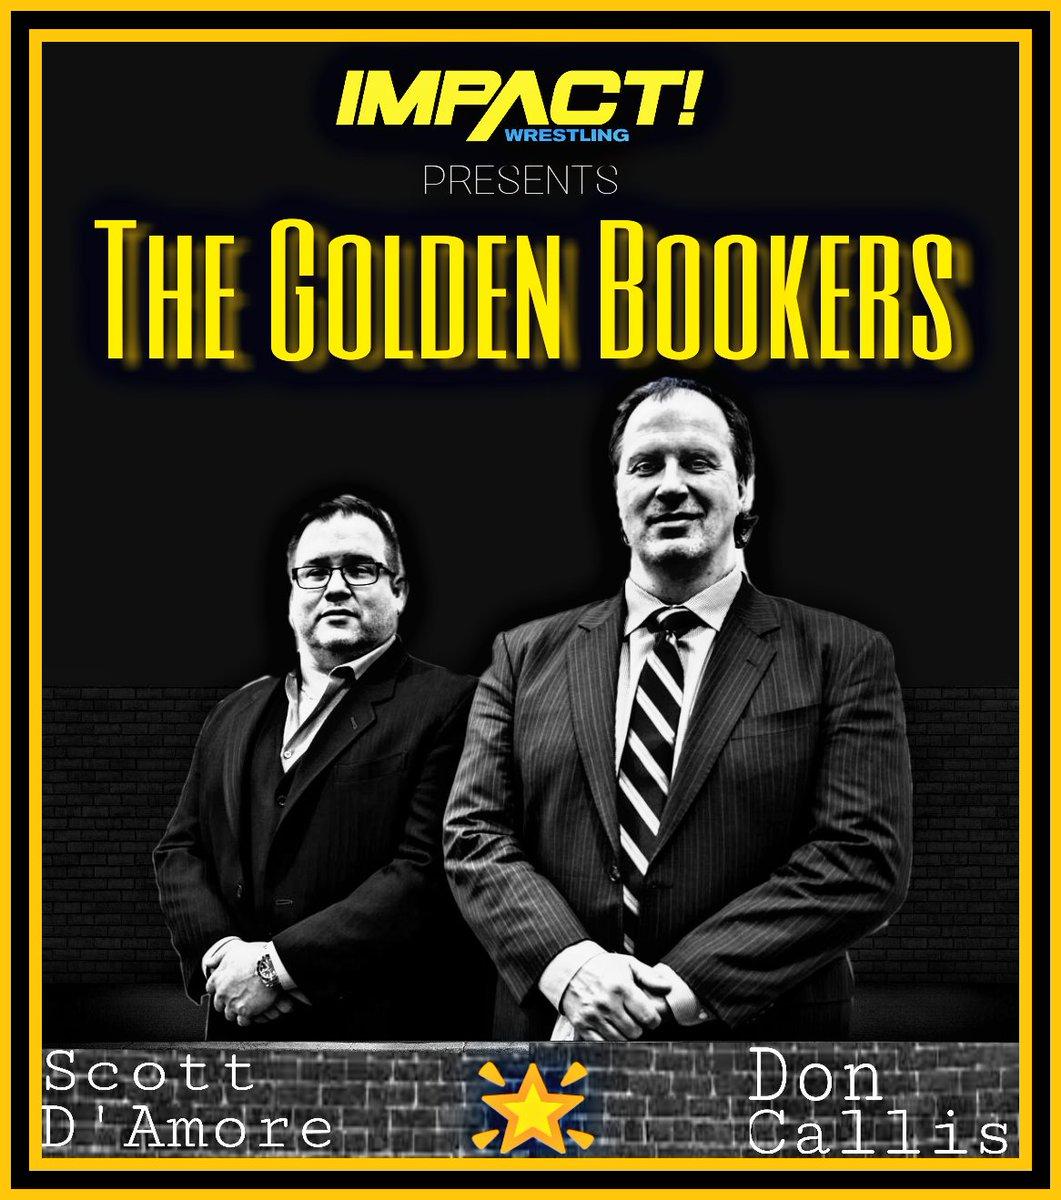 @tuxedo_mask23 @IMPACTWRESTLING Believe in the #GoldenBookers